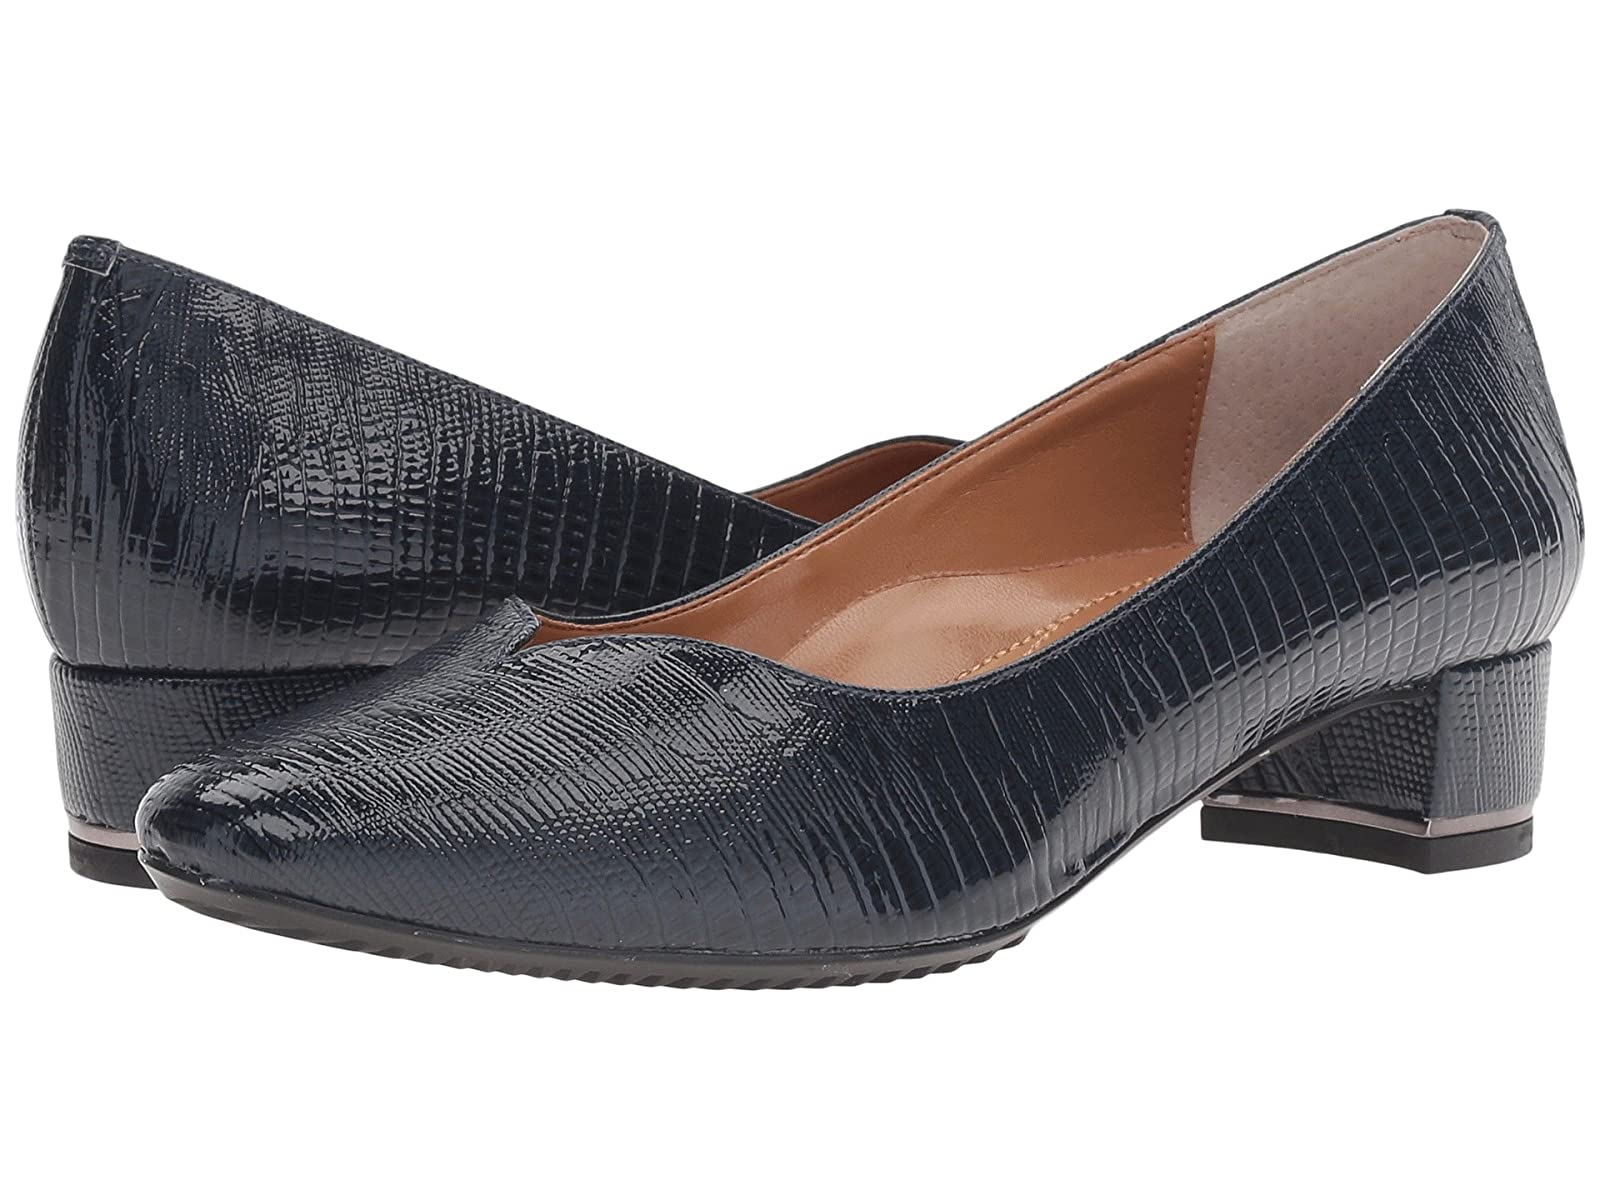 J. Renee BambalinaAtmospheric grades have affordable shoes